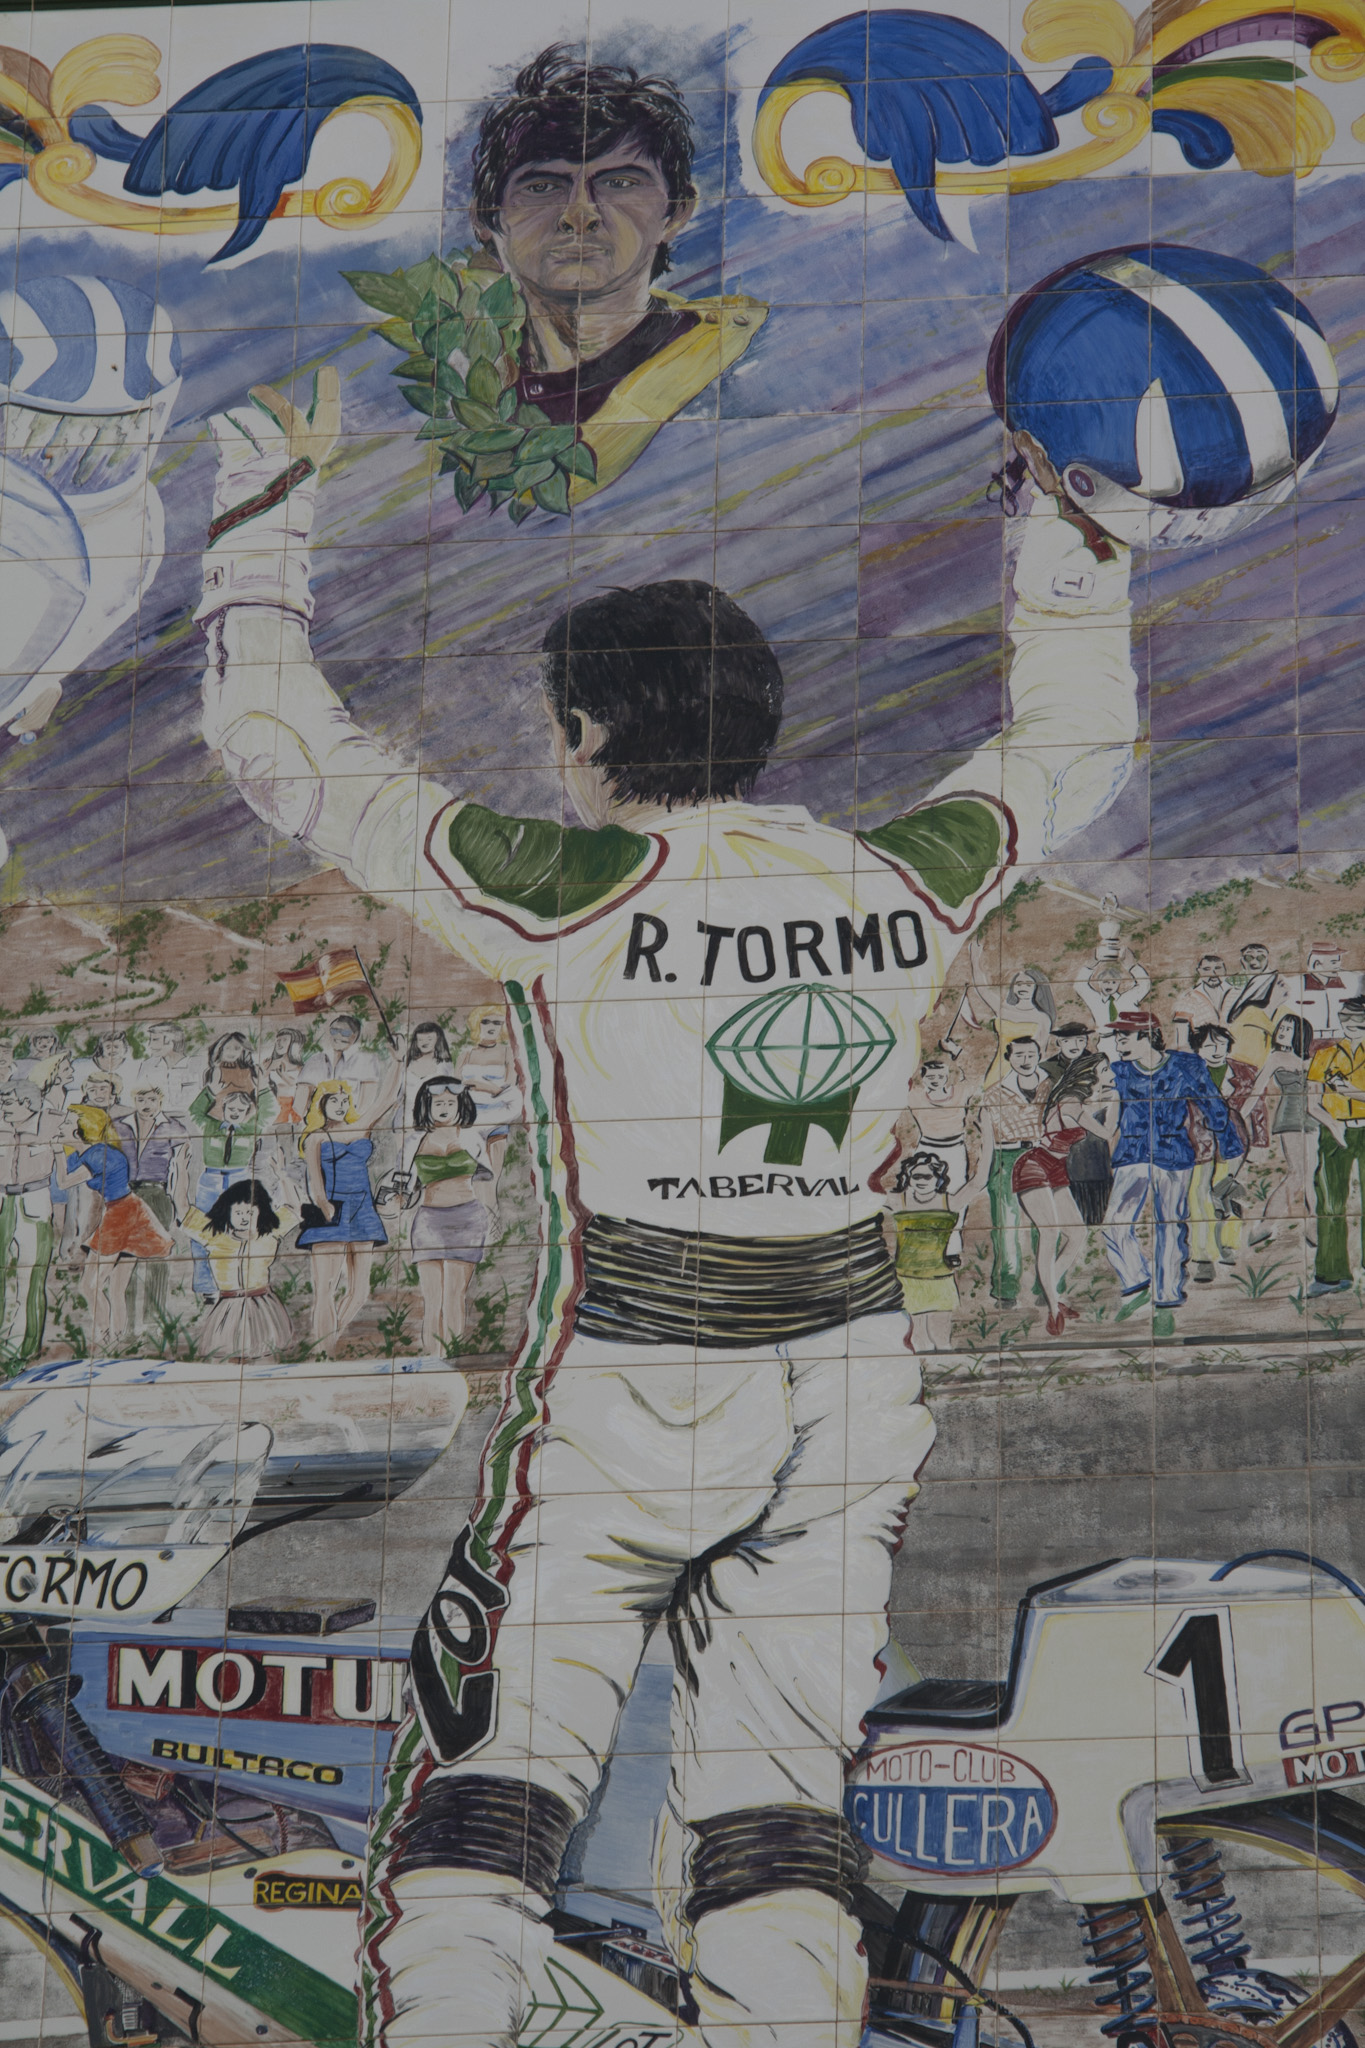 Pavelló Municipal Ricardo Tormo (3).jpg